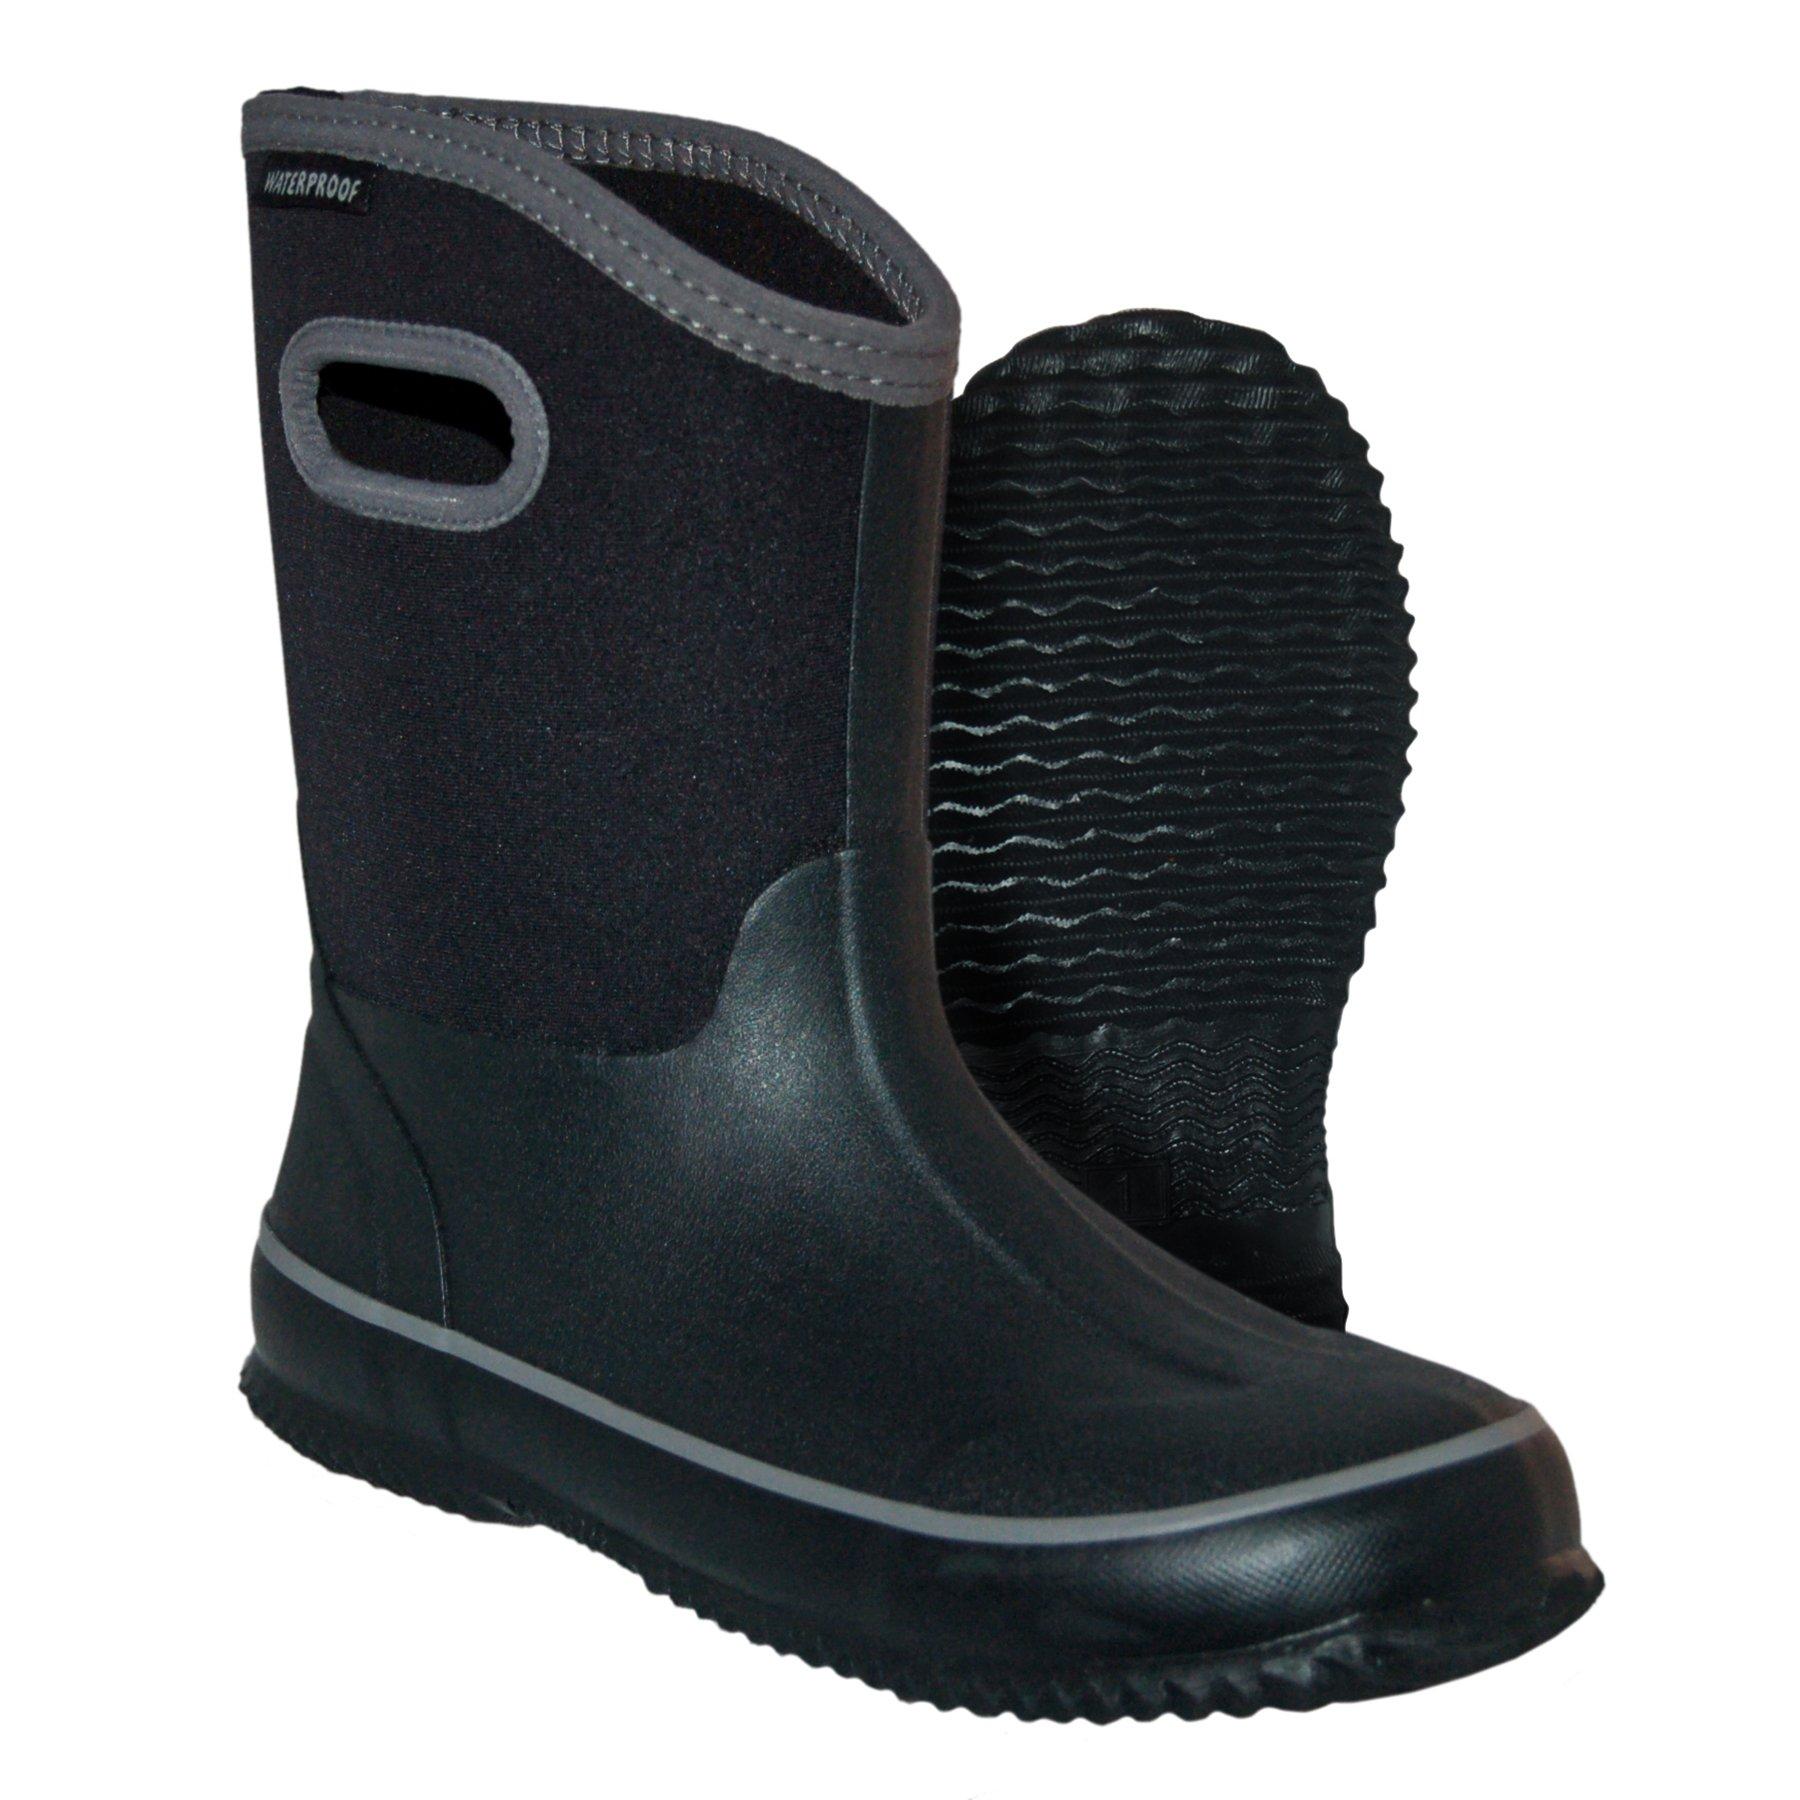 Itasca Unisex Youth Bayou Rubber/Neoprene Waterproof Boots Rain, Black, 4.0 Standard US Width US Big Kid